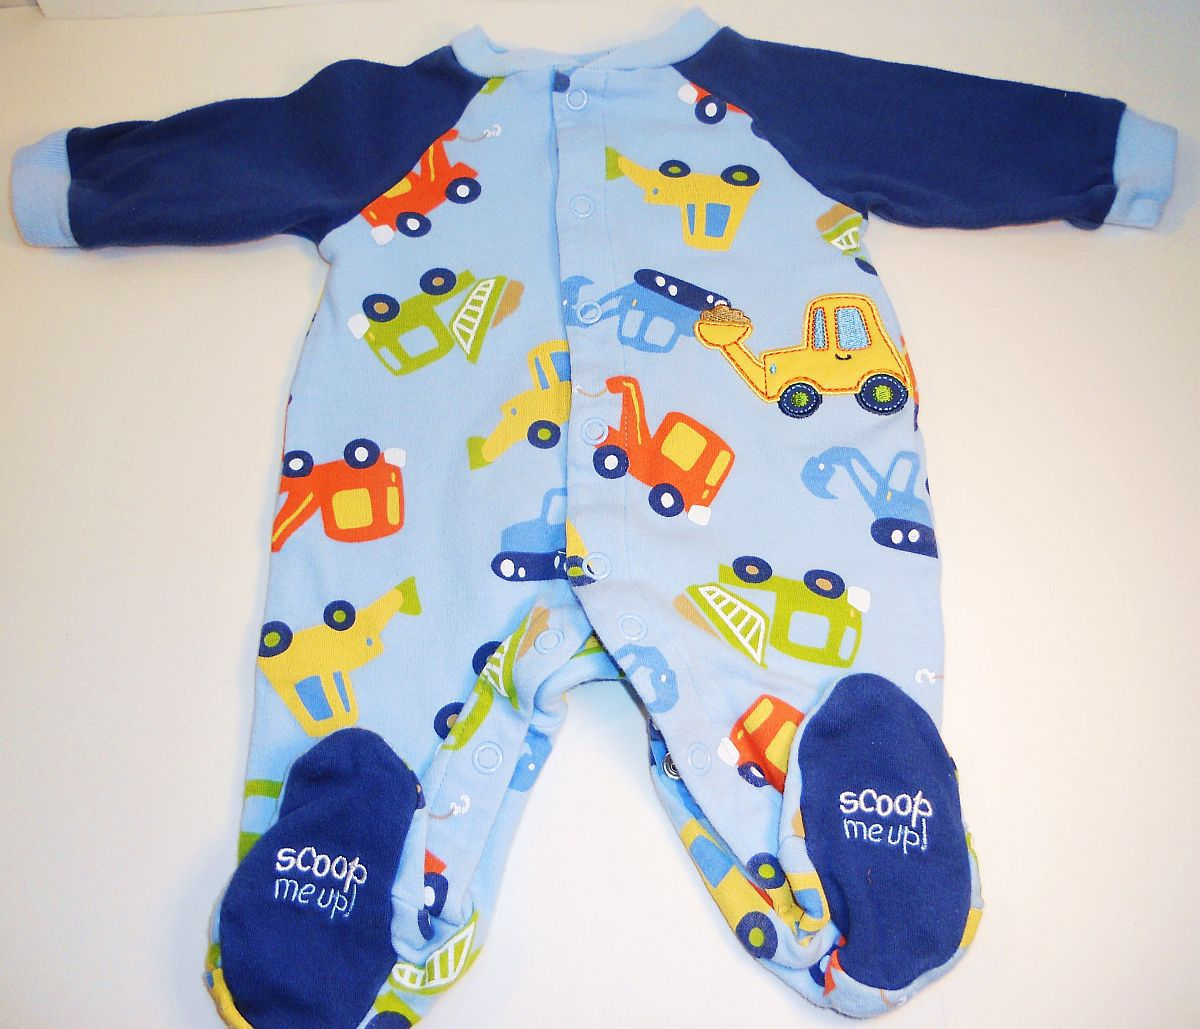 20b4e8a43958 Carter s boys One piece footie pajamas and 50 similar items